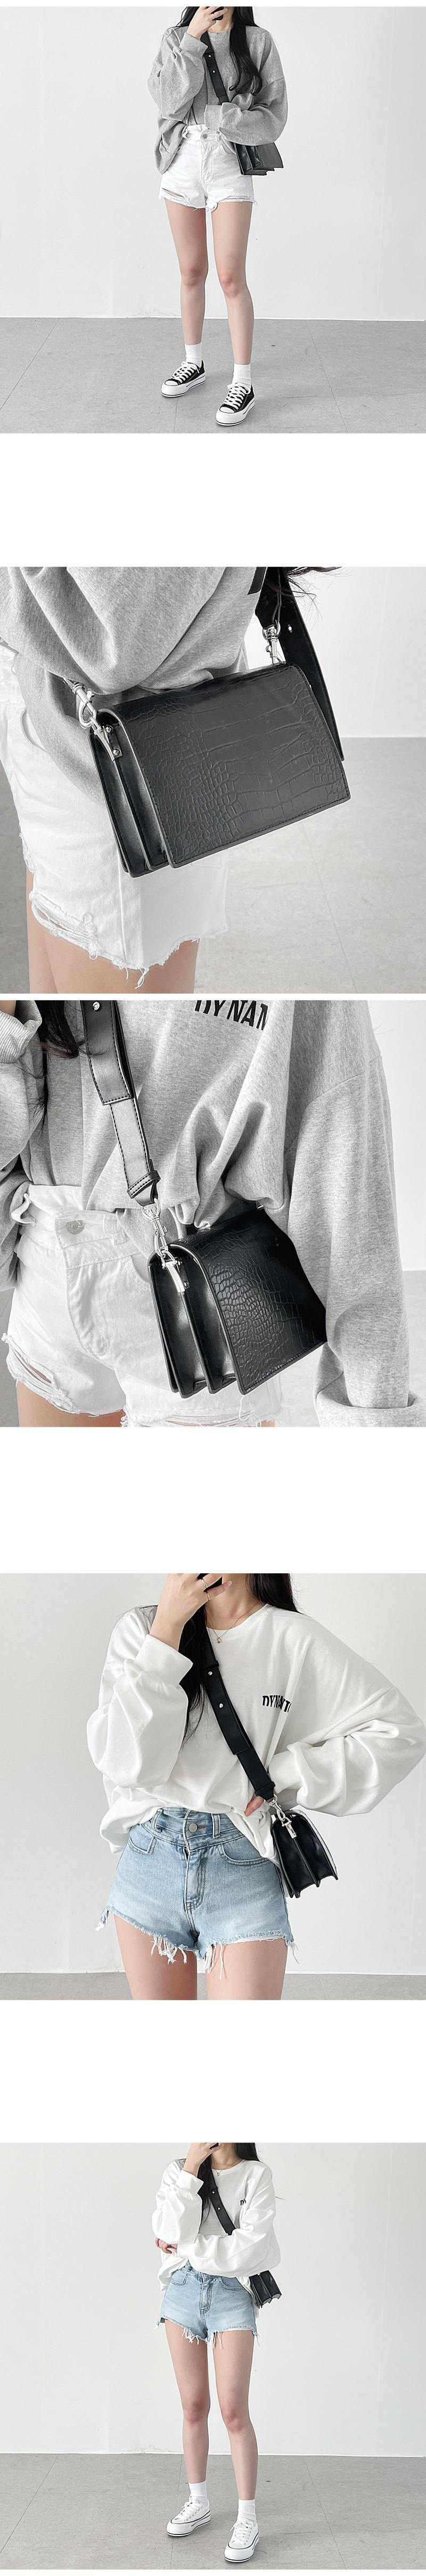 Loa Square Cross & Shoulder Bag